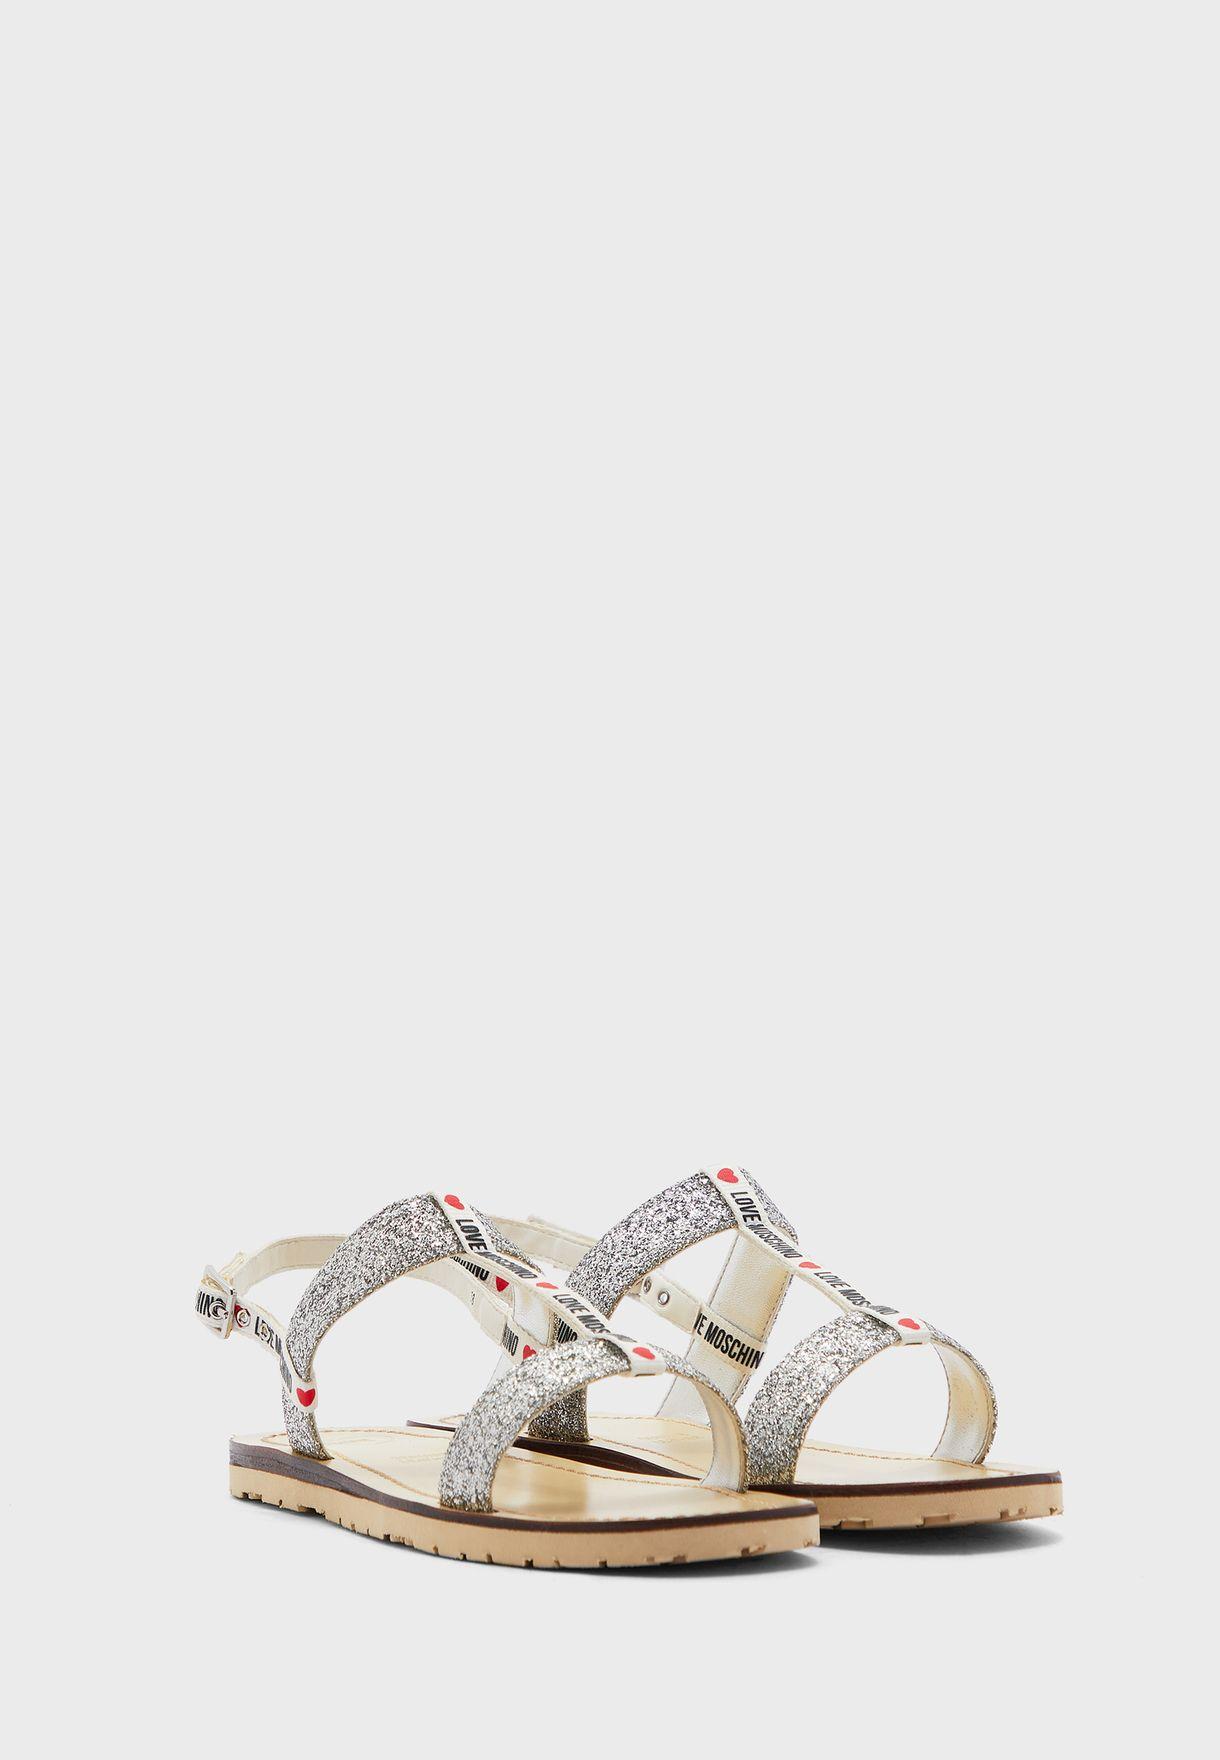 Ankle Strap Flat Sandal - Argento